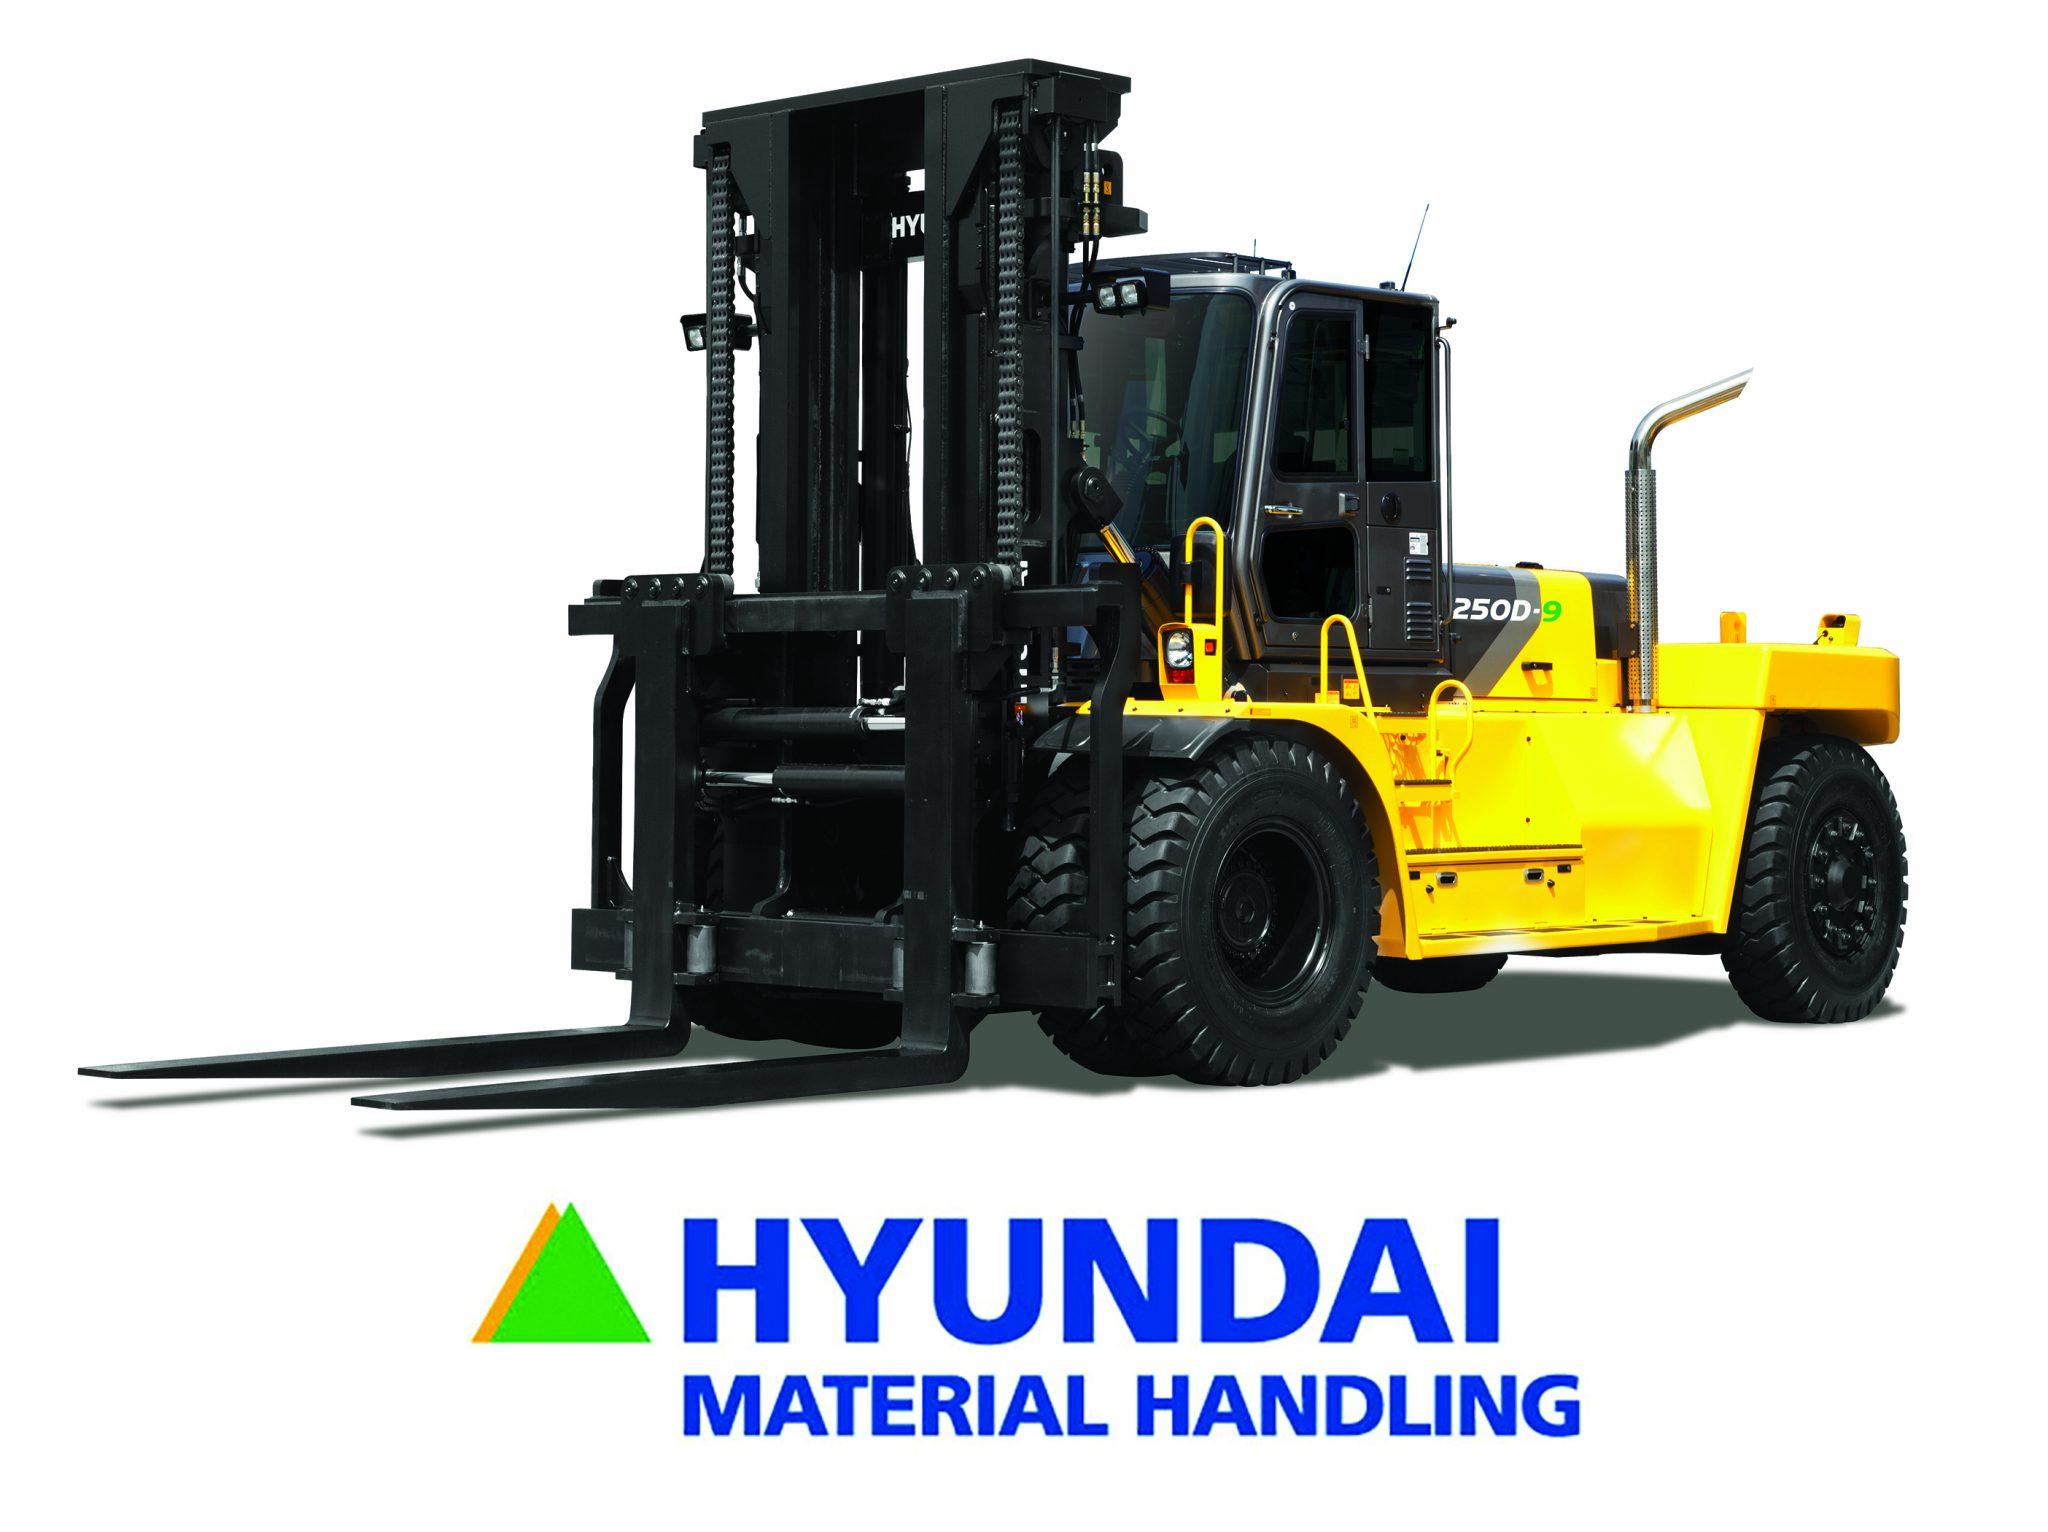 New Hyundai Forklifts